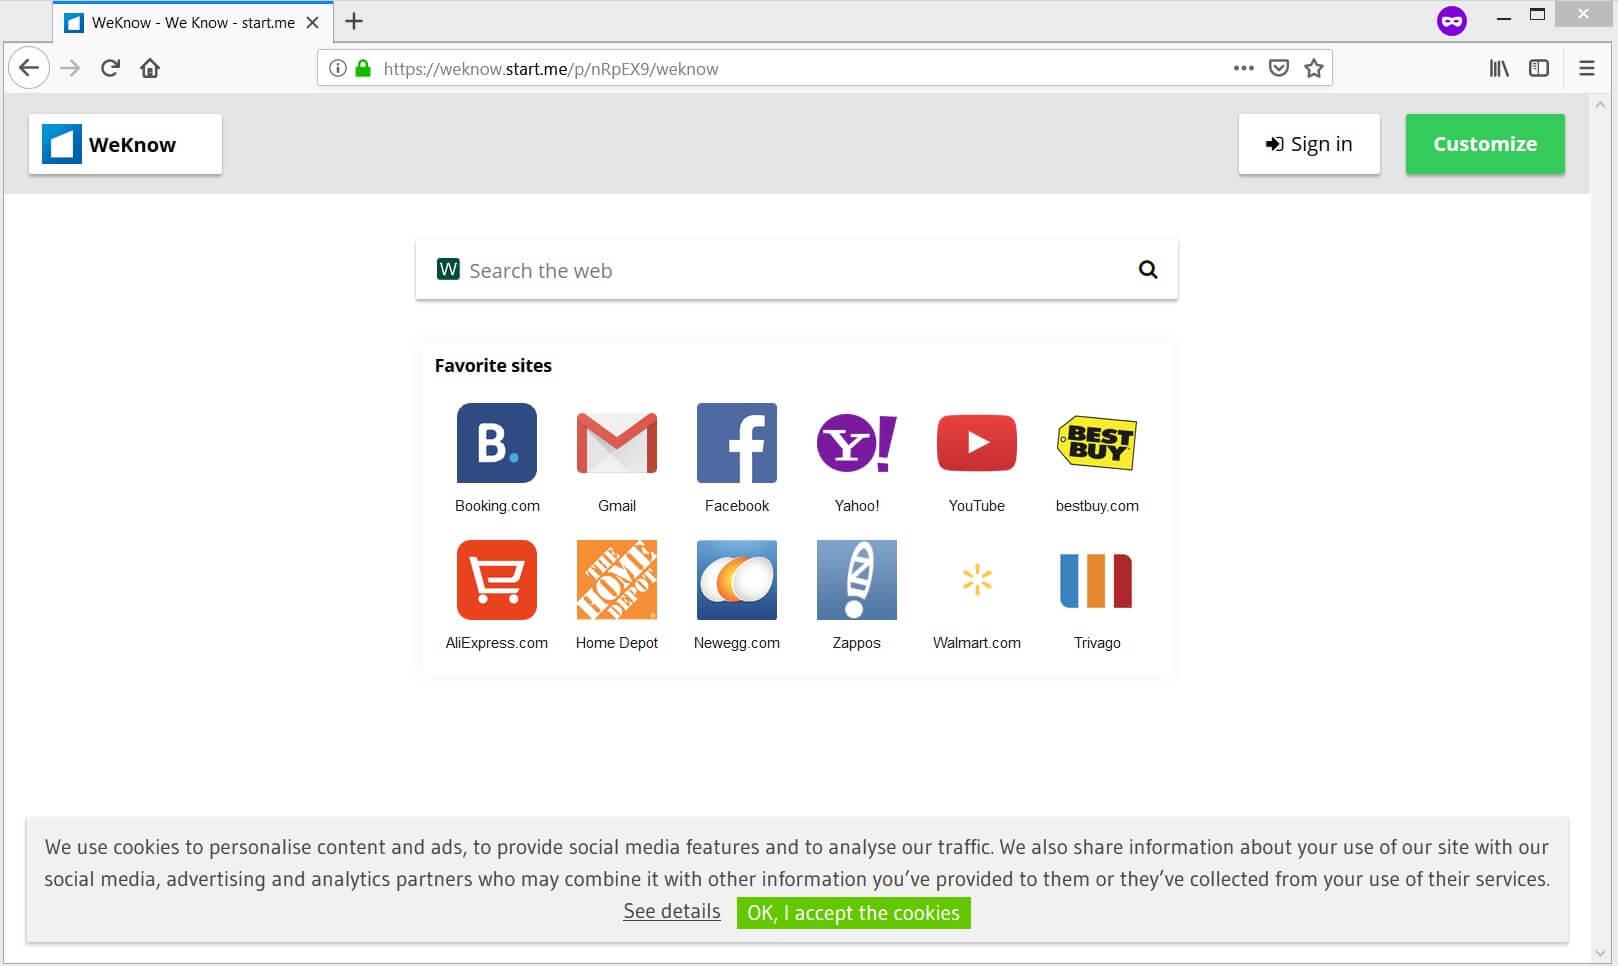 weknow.start.me browser hijacker mac sensorstechforum guide